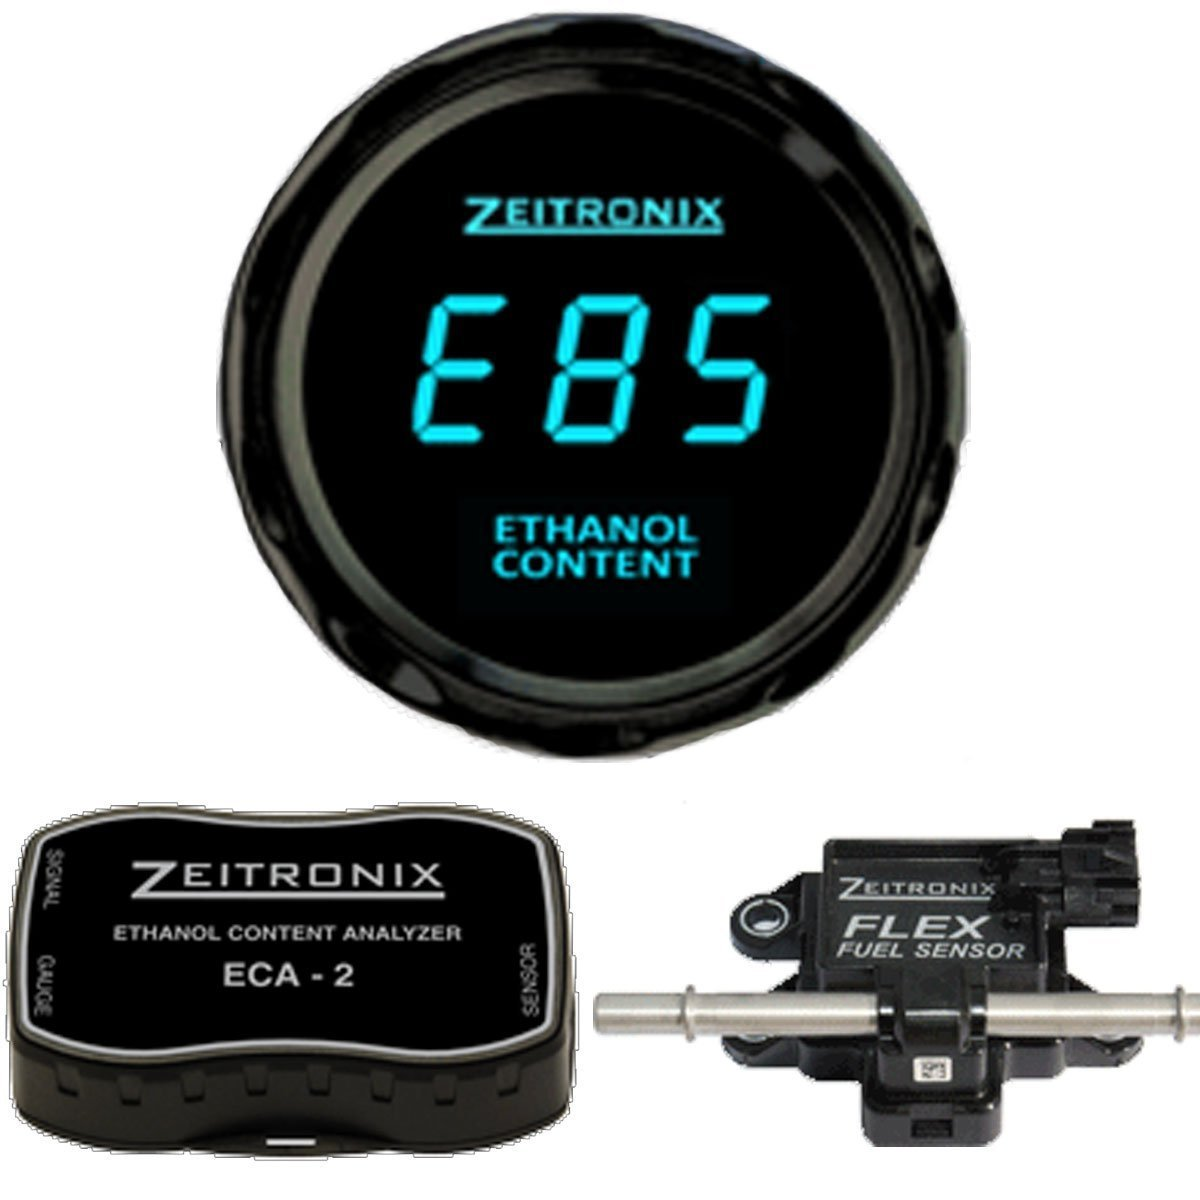 Zeitronix ECA-2 Ethanol E/% Content Analyzer Kit with Blue Display Gauge